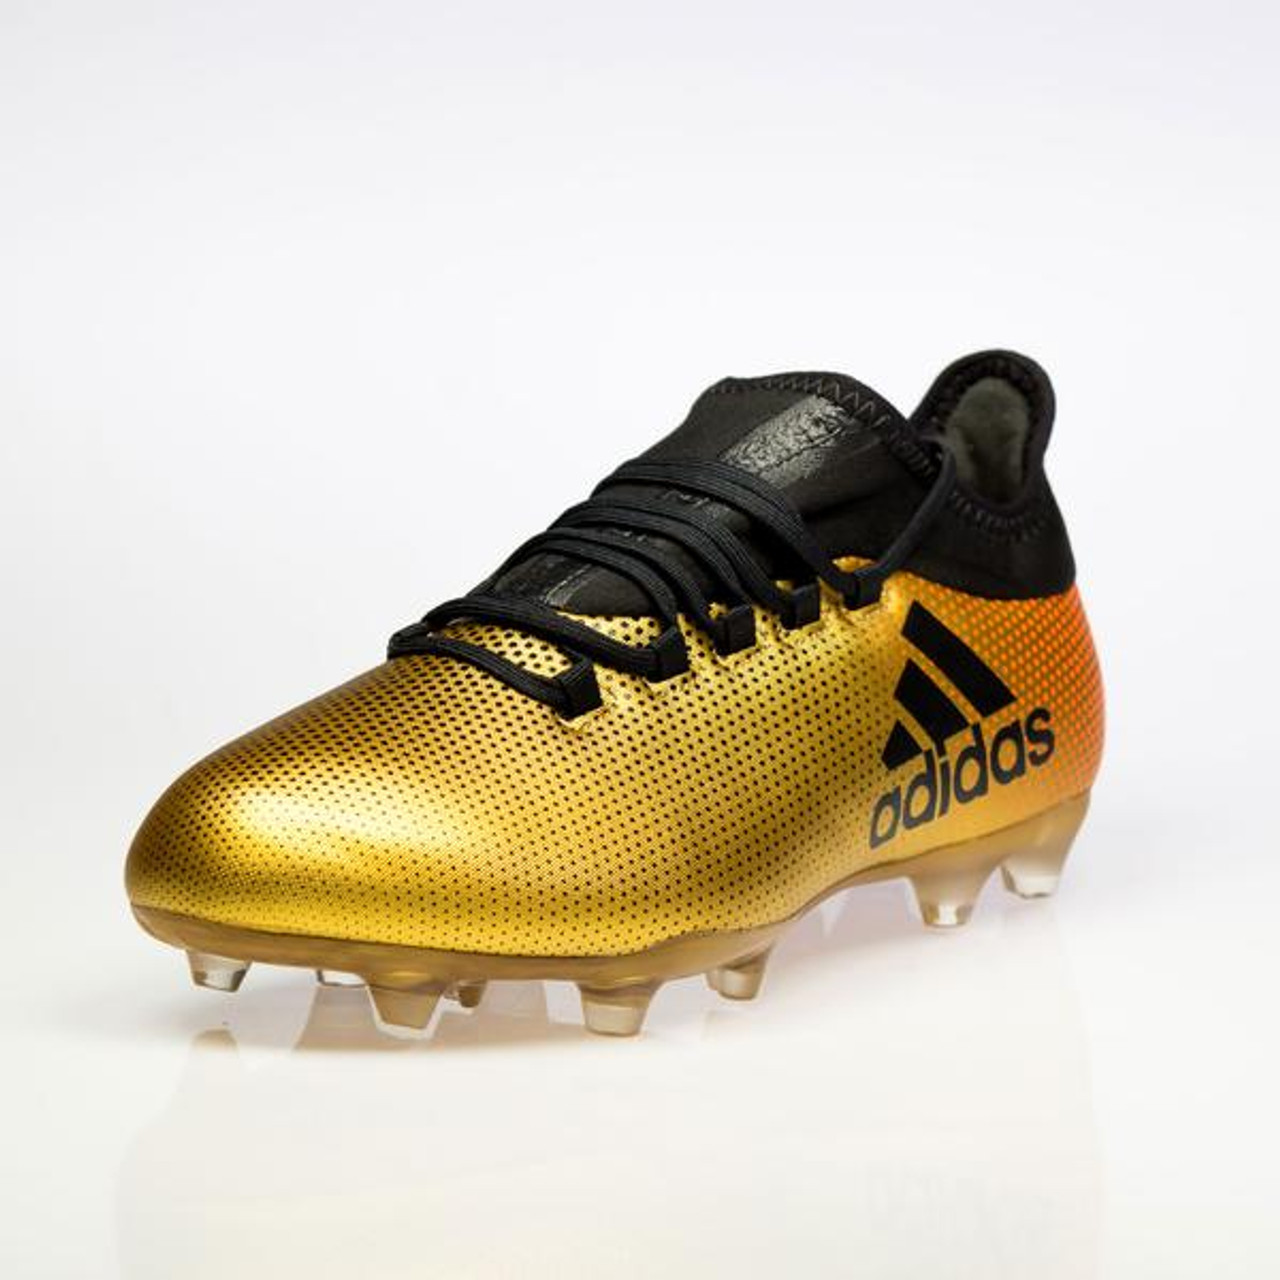 f59ba5156 ... Adidas X 17.2 FG Men s Soccer Cleats CP9186 - Gold